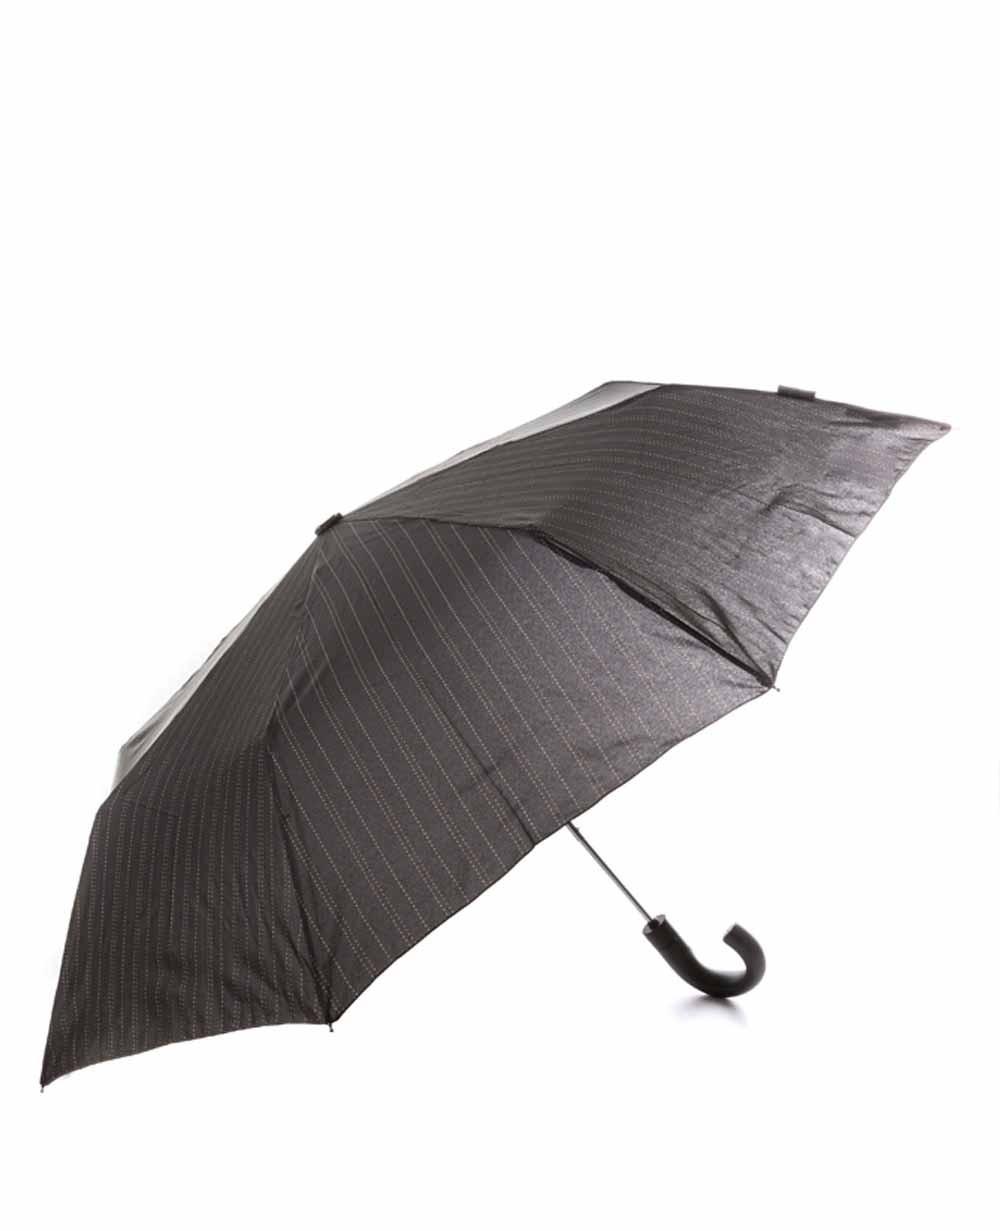 Pierre Cardin Paraguas plegable automático Negro (Foto )